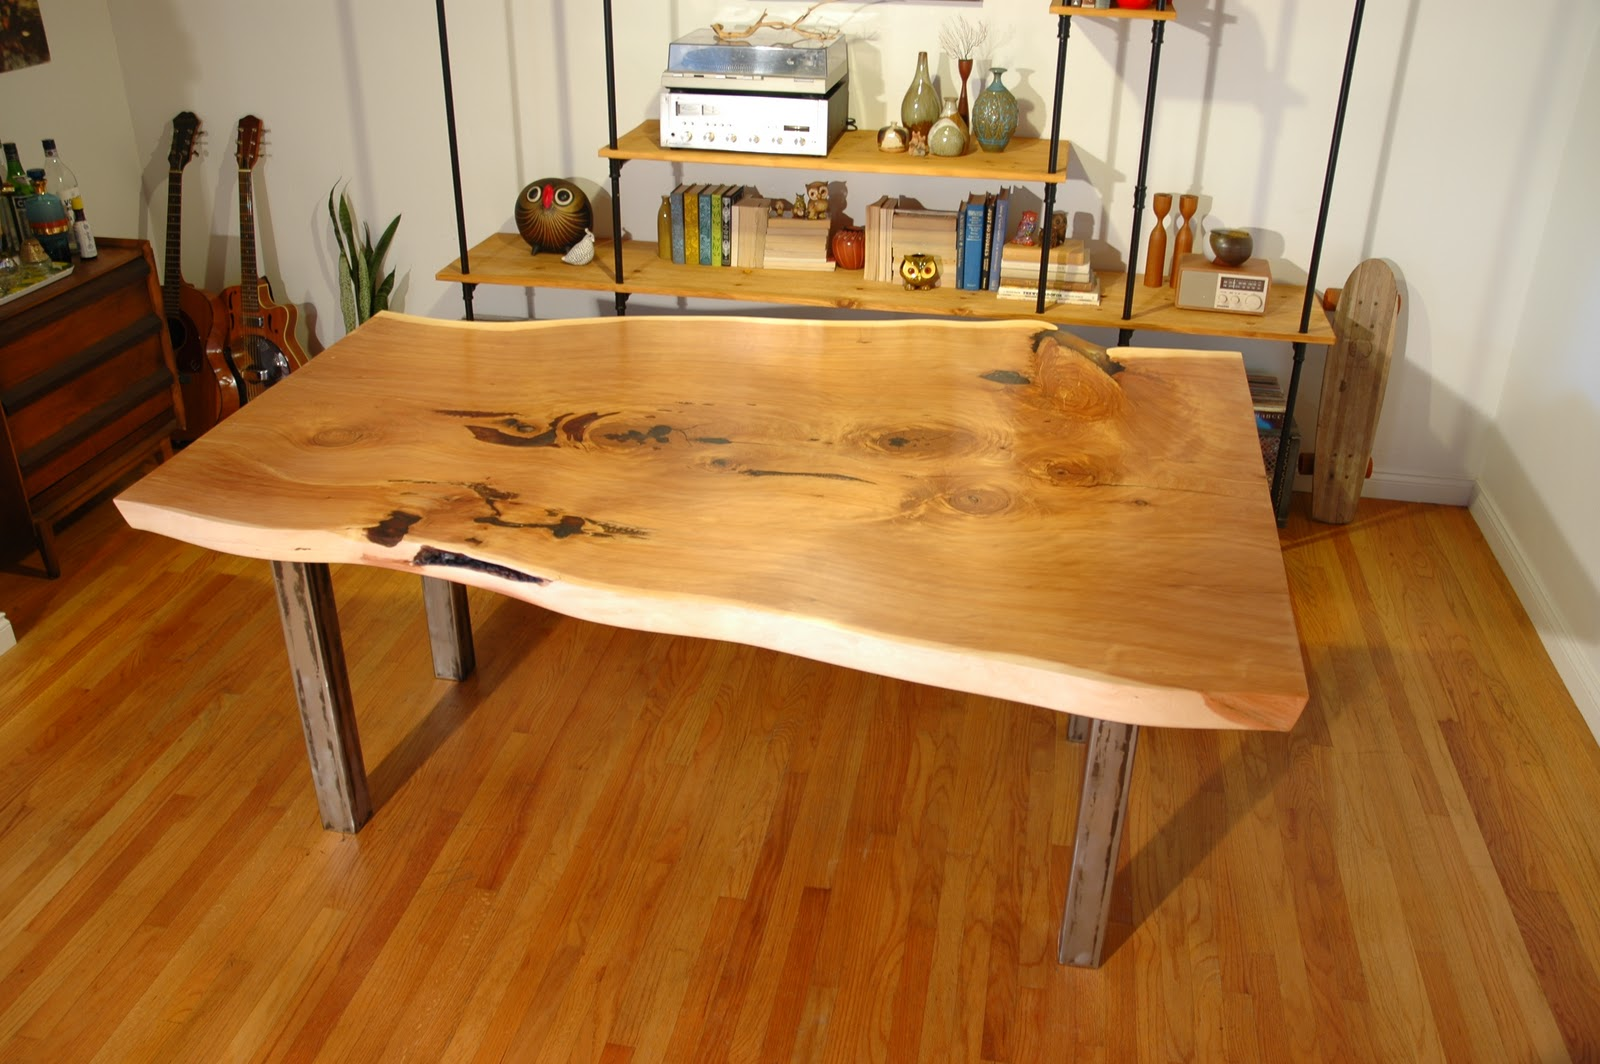 rael wood rael made : junipertable2 from raelwood.blogspot.com size 1600 x 1064 jpeg 228kB